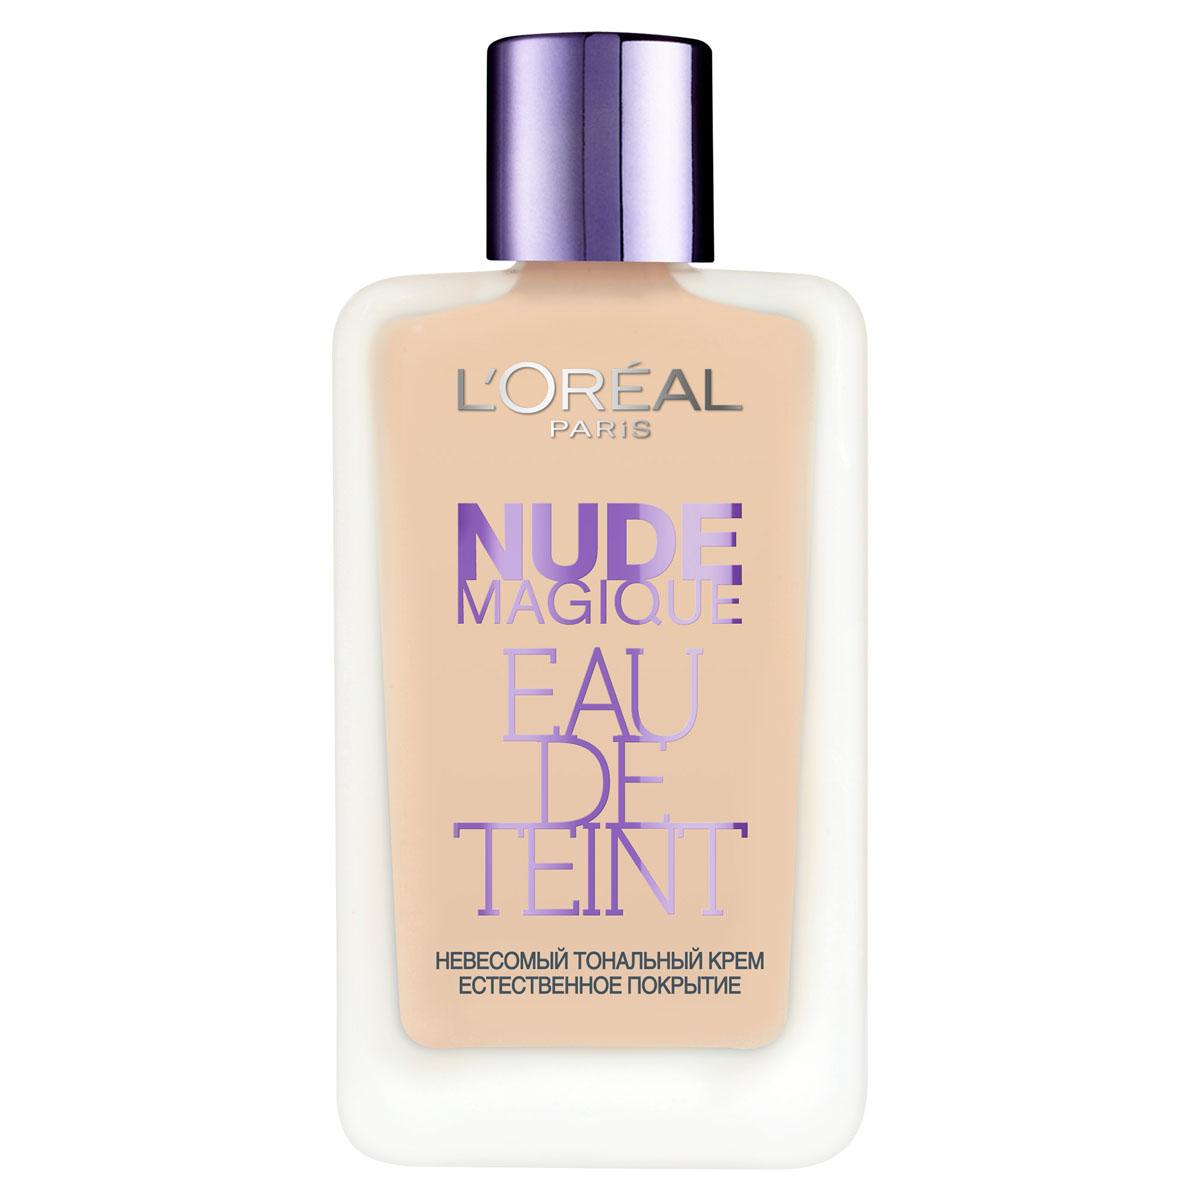 LOreal Paris ��������� ��������� ���� ��� ���� Nude Magique Eau De Teint, ��� �100 ������, 20 �� - LOreal ParisA7392700��������� ��������� ���� Nude Magique. ������������� �������: � ������ �������� ������ �������� ��������� ���������, ��������� ������, ����������� � ����� ��������. ������� ���������� �������� ���������� �� ���� ��������� �� ����, �������� ������ �������� ����. �� ���� �������� ������ ����������� ���������� ��������� ������. ��� ���������: ��������� ��������, ������, ����������� ������������ ���� ����. ��������� ������� � ����� ����: ��� ������ � ������� �����. ��������, ������� ��������. �������� ���������� �������.